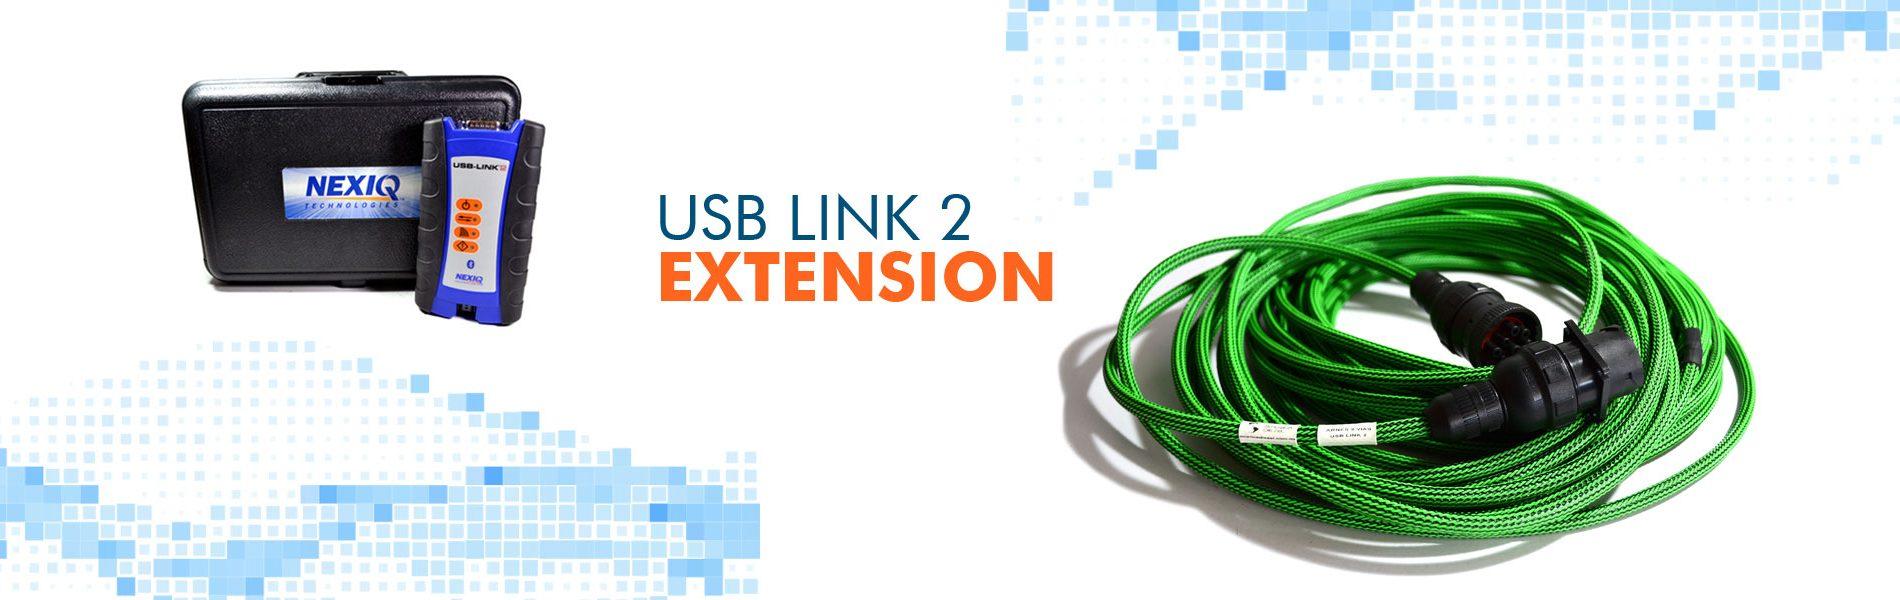 USB Link 2 Extension